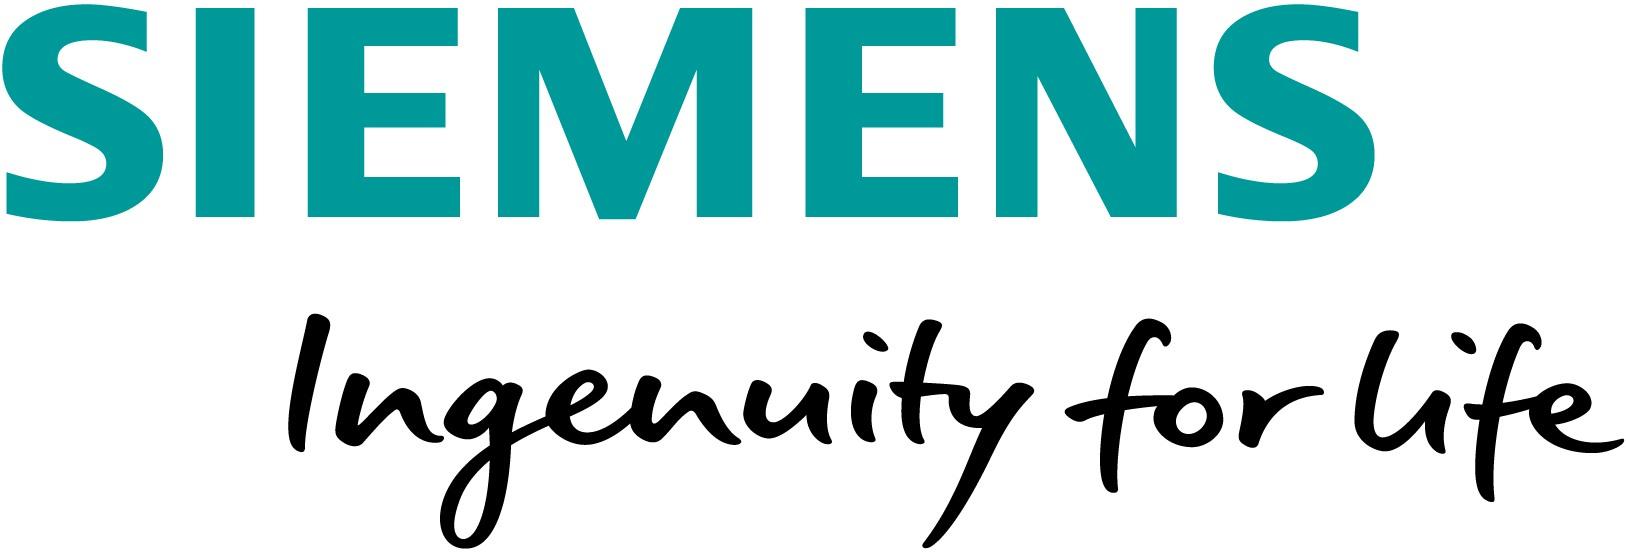 Siemens Ingenuity logo